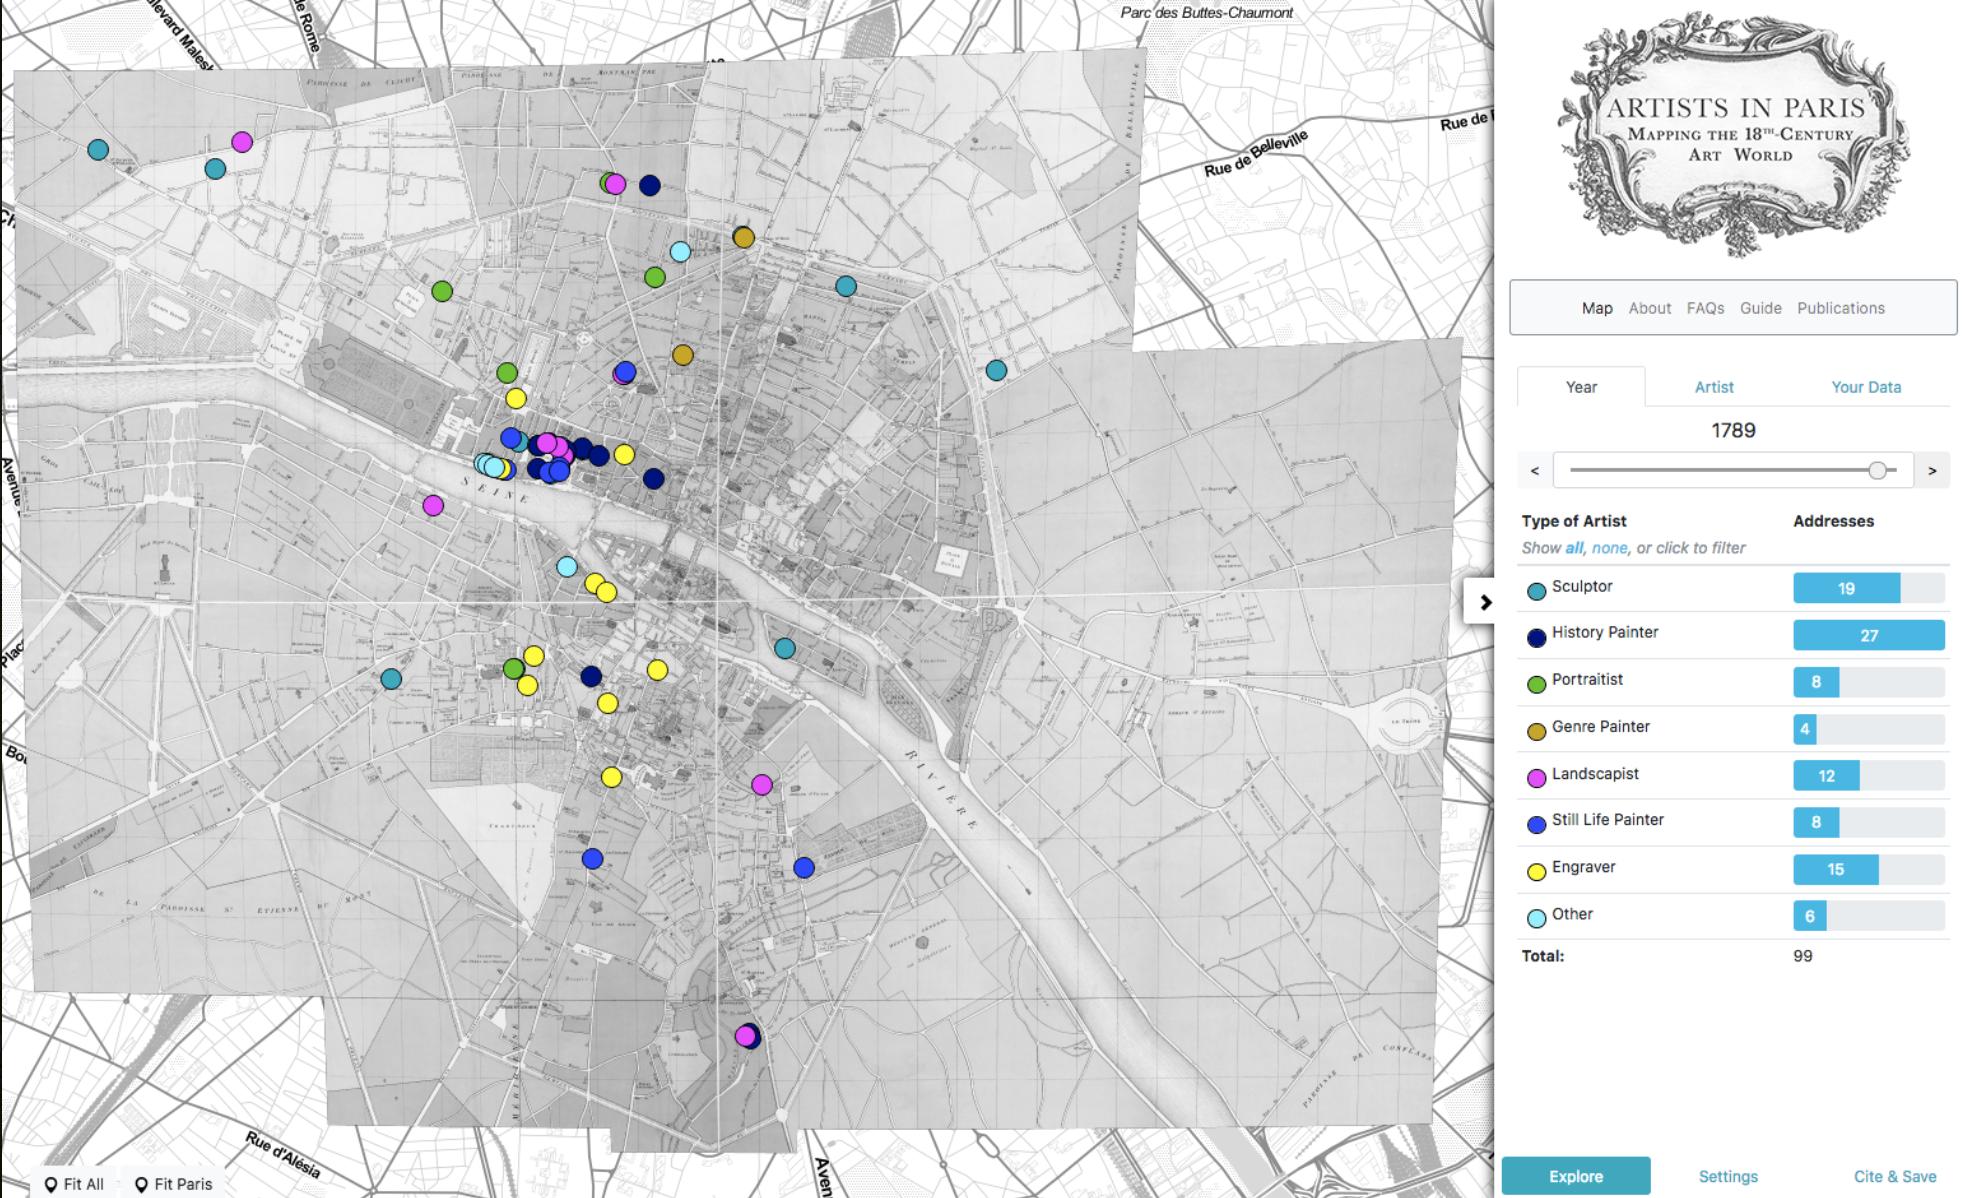 Map of Paris highlighting artists' addresses.